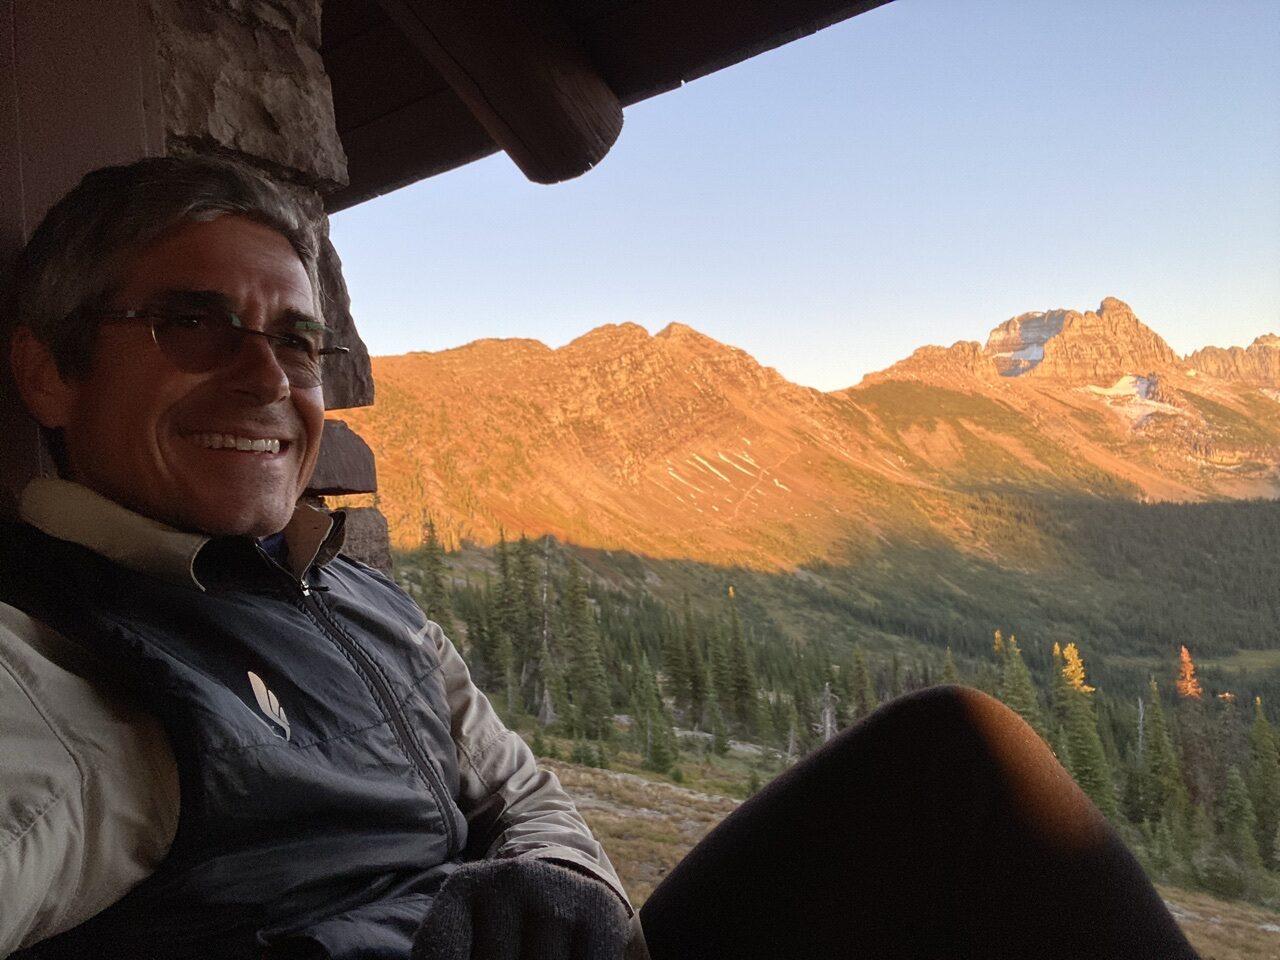 Mountains through chalet window, with jeff noel sitting on window ledge